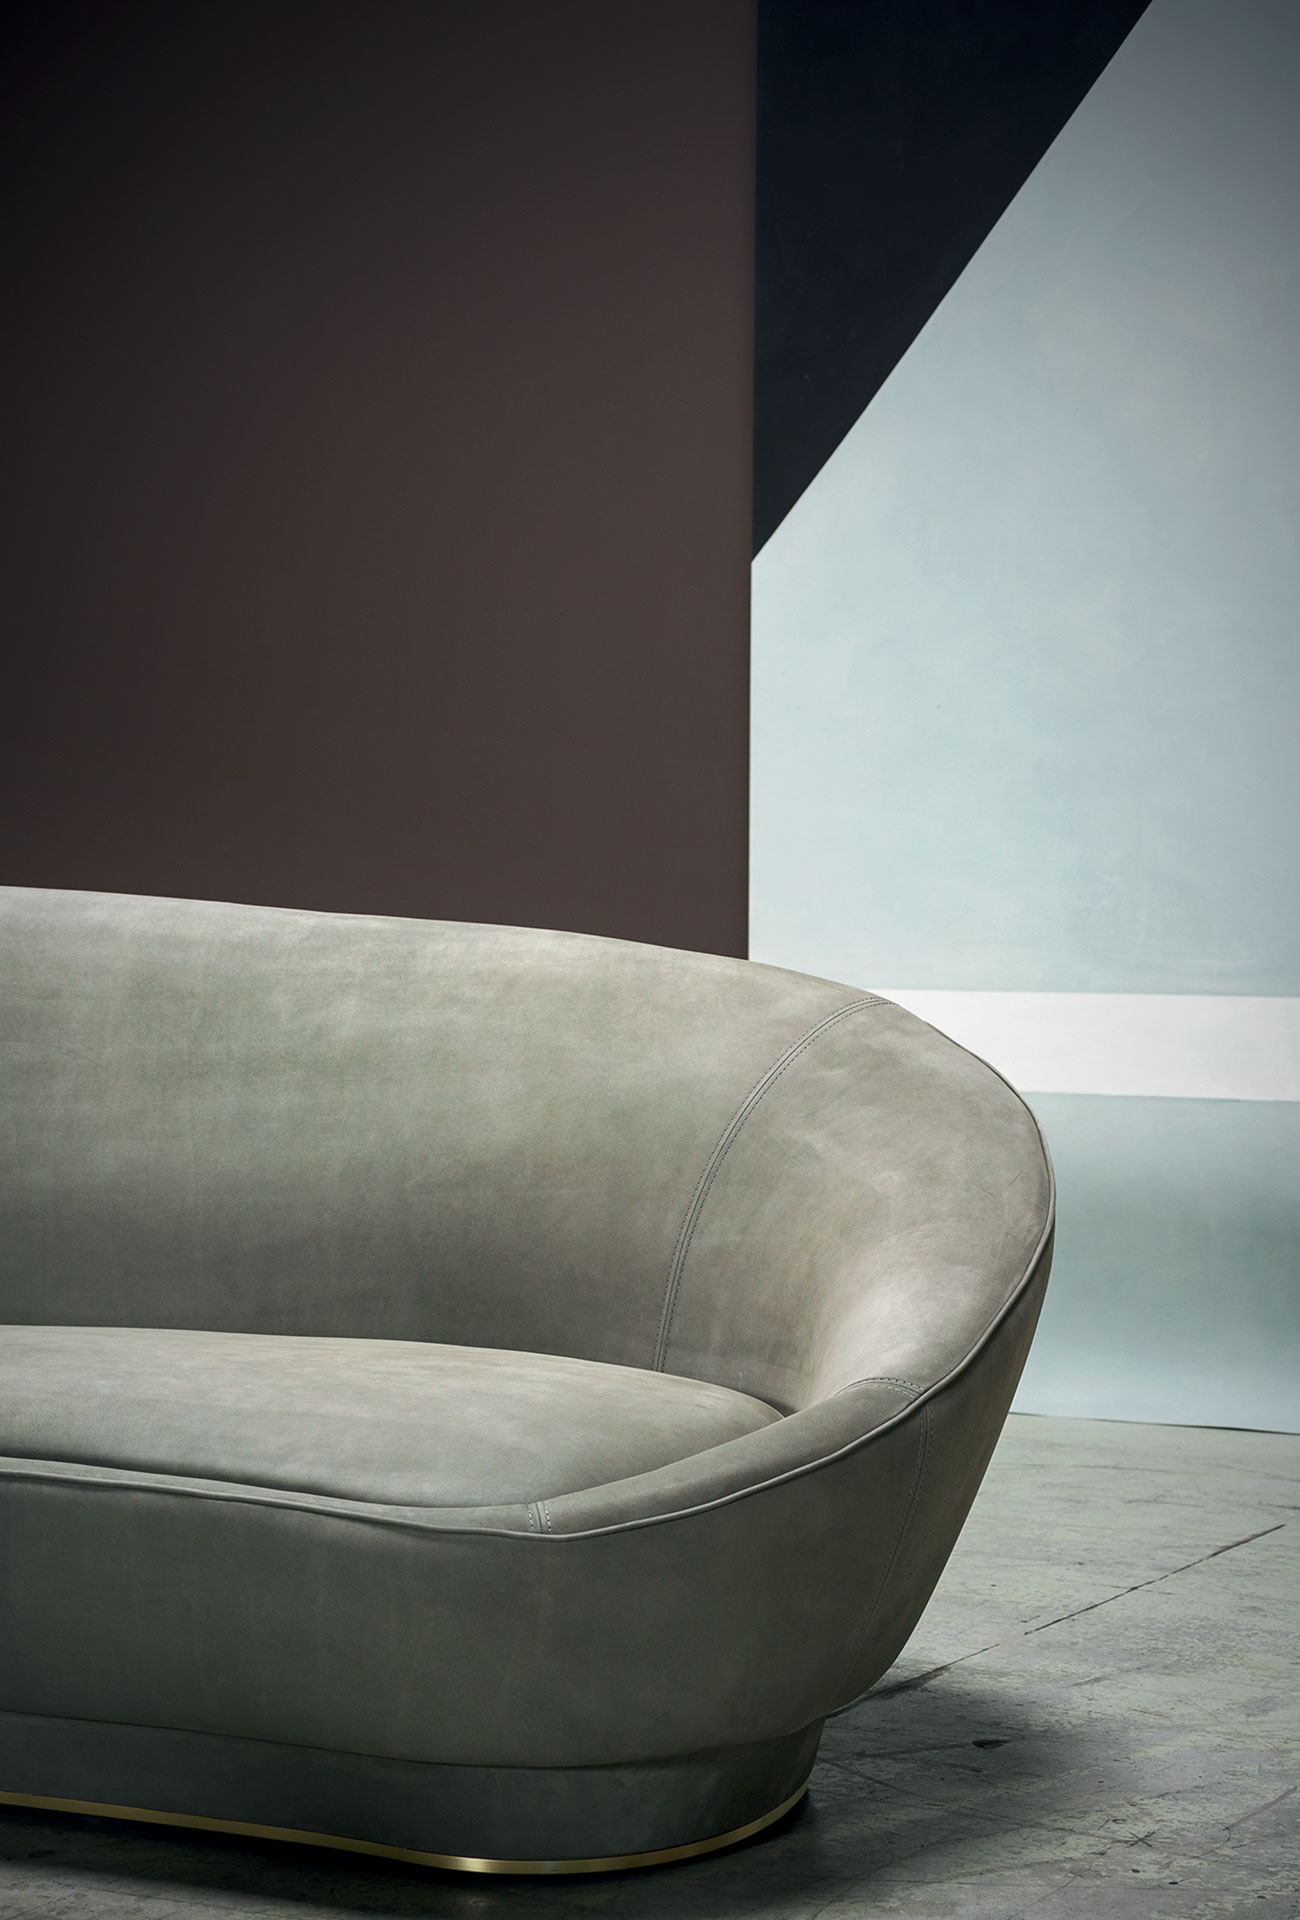 Sofa Janette Bellavita Luxury